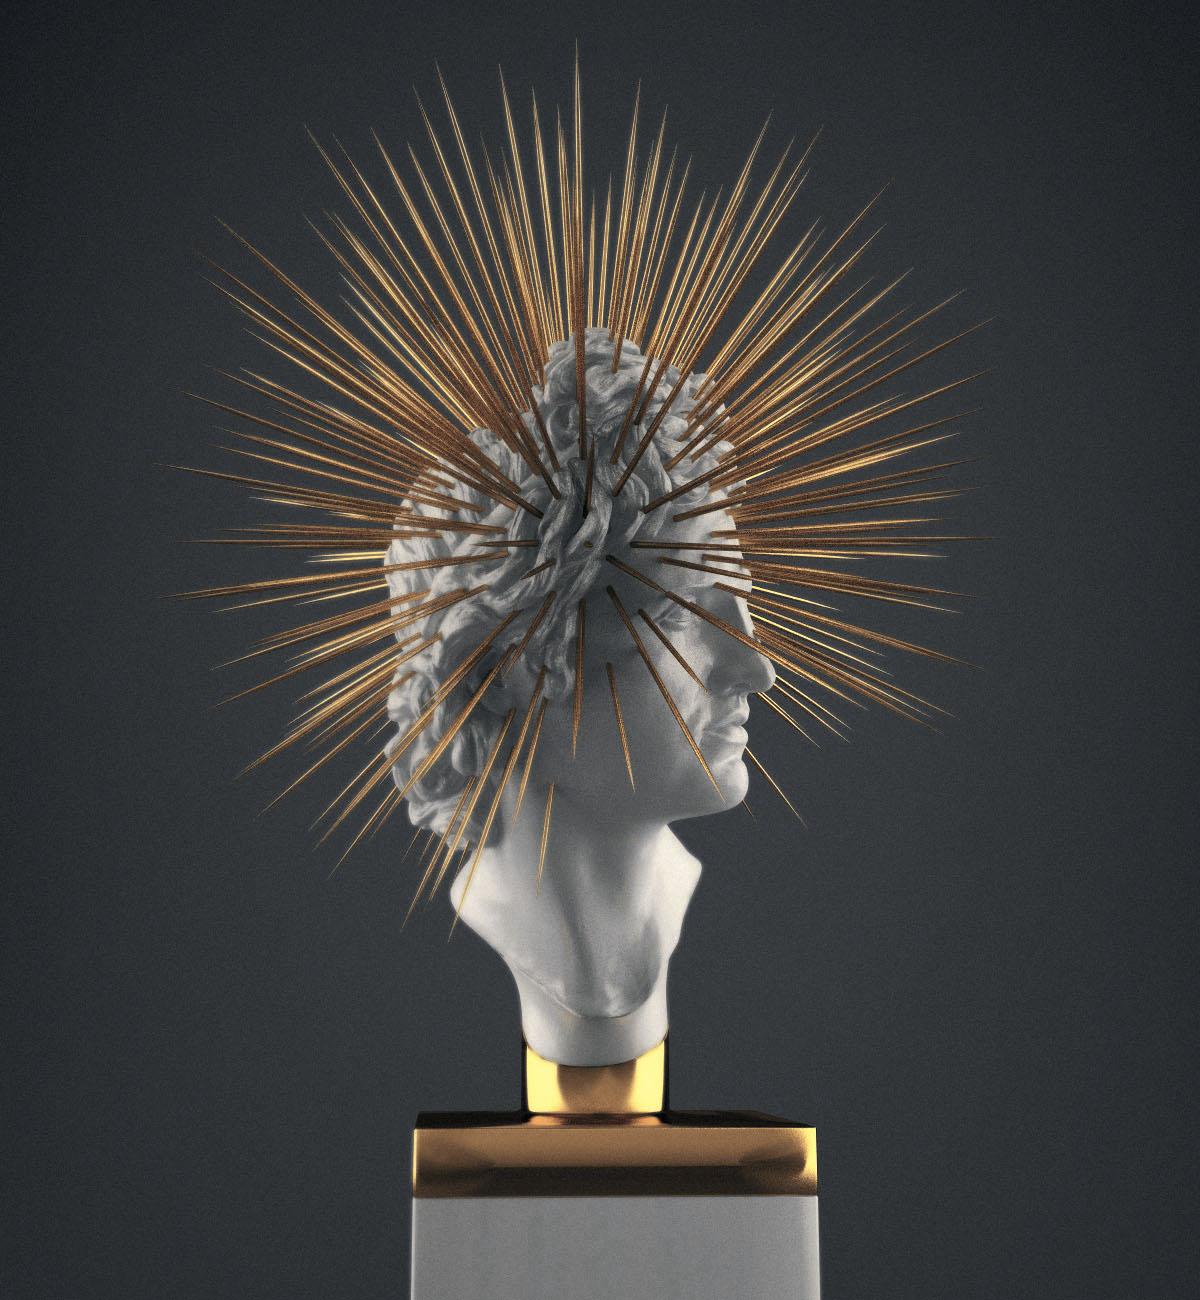 Creative-Sculptures-by-Hedi-Xandt16.jpg